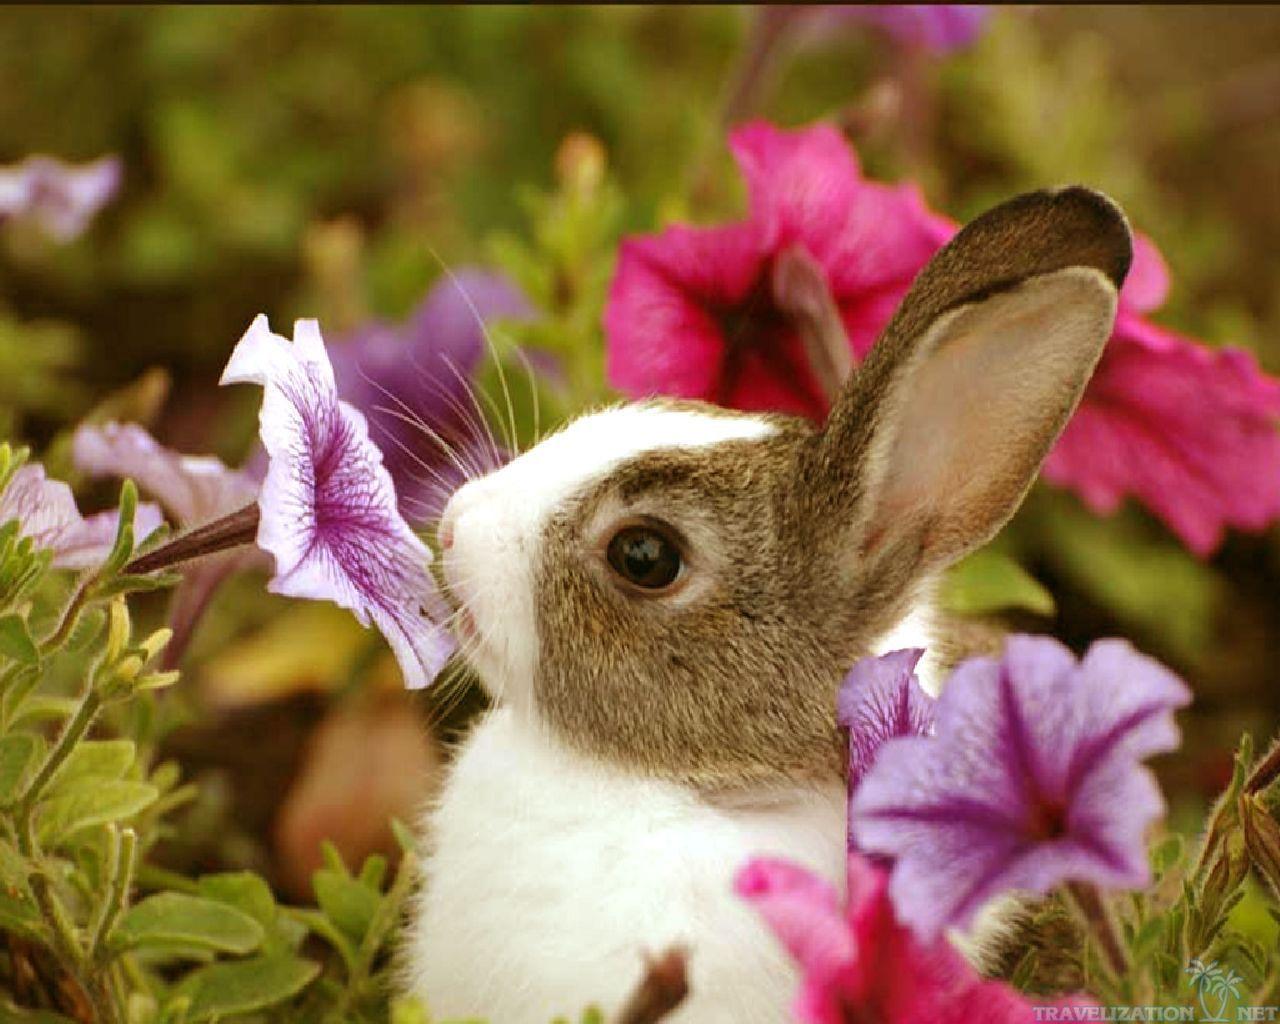 Cute Baby Bunnies Wallpaper For Desktop 14 HD Wallpapers